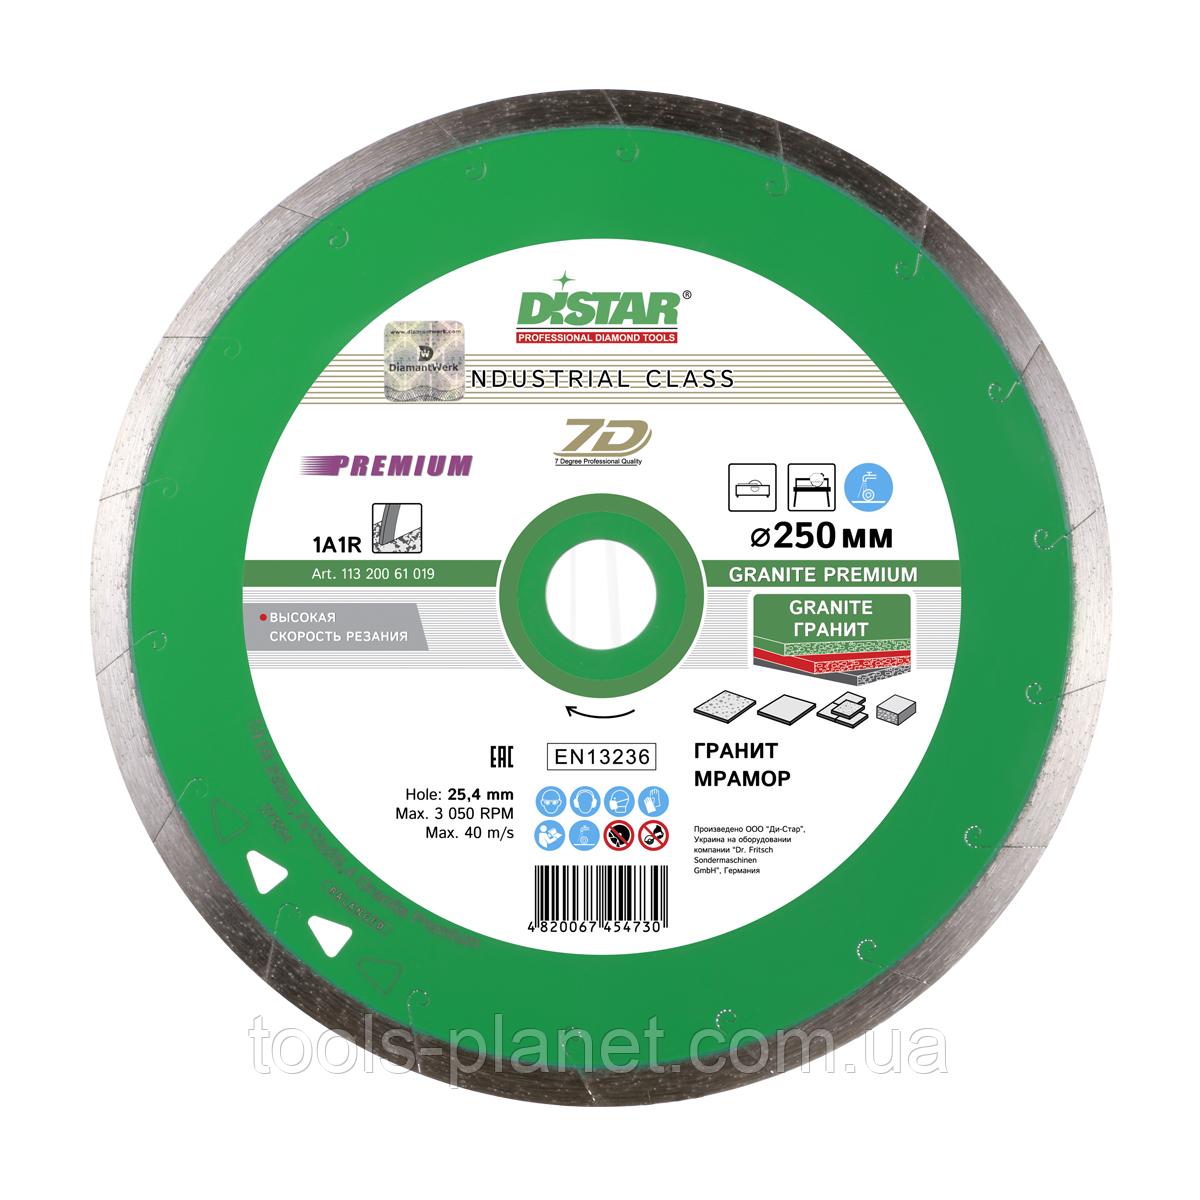 Алмазный диск Distar 1A1R 300 x 2,4 x 10 x 32 Granite Premium 7D (11327061022)